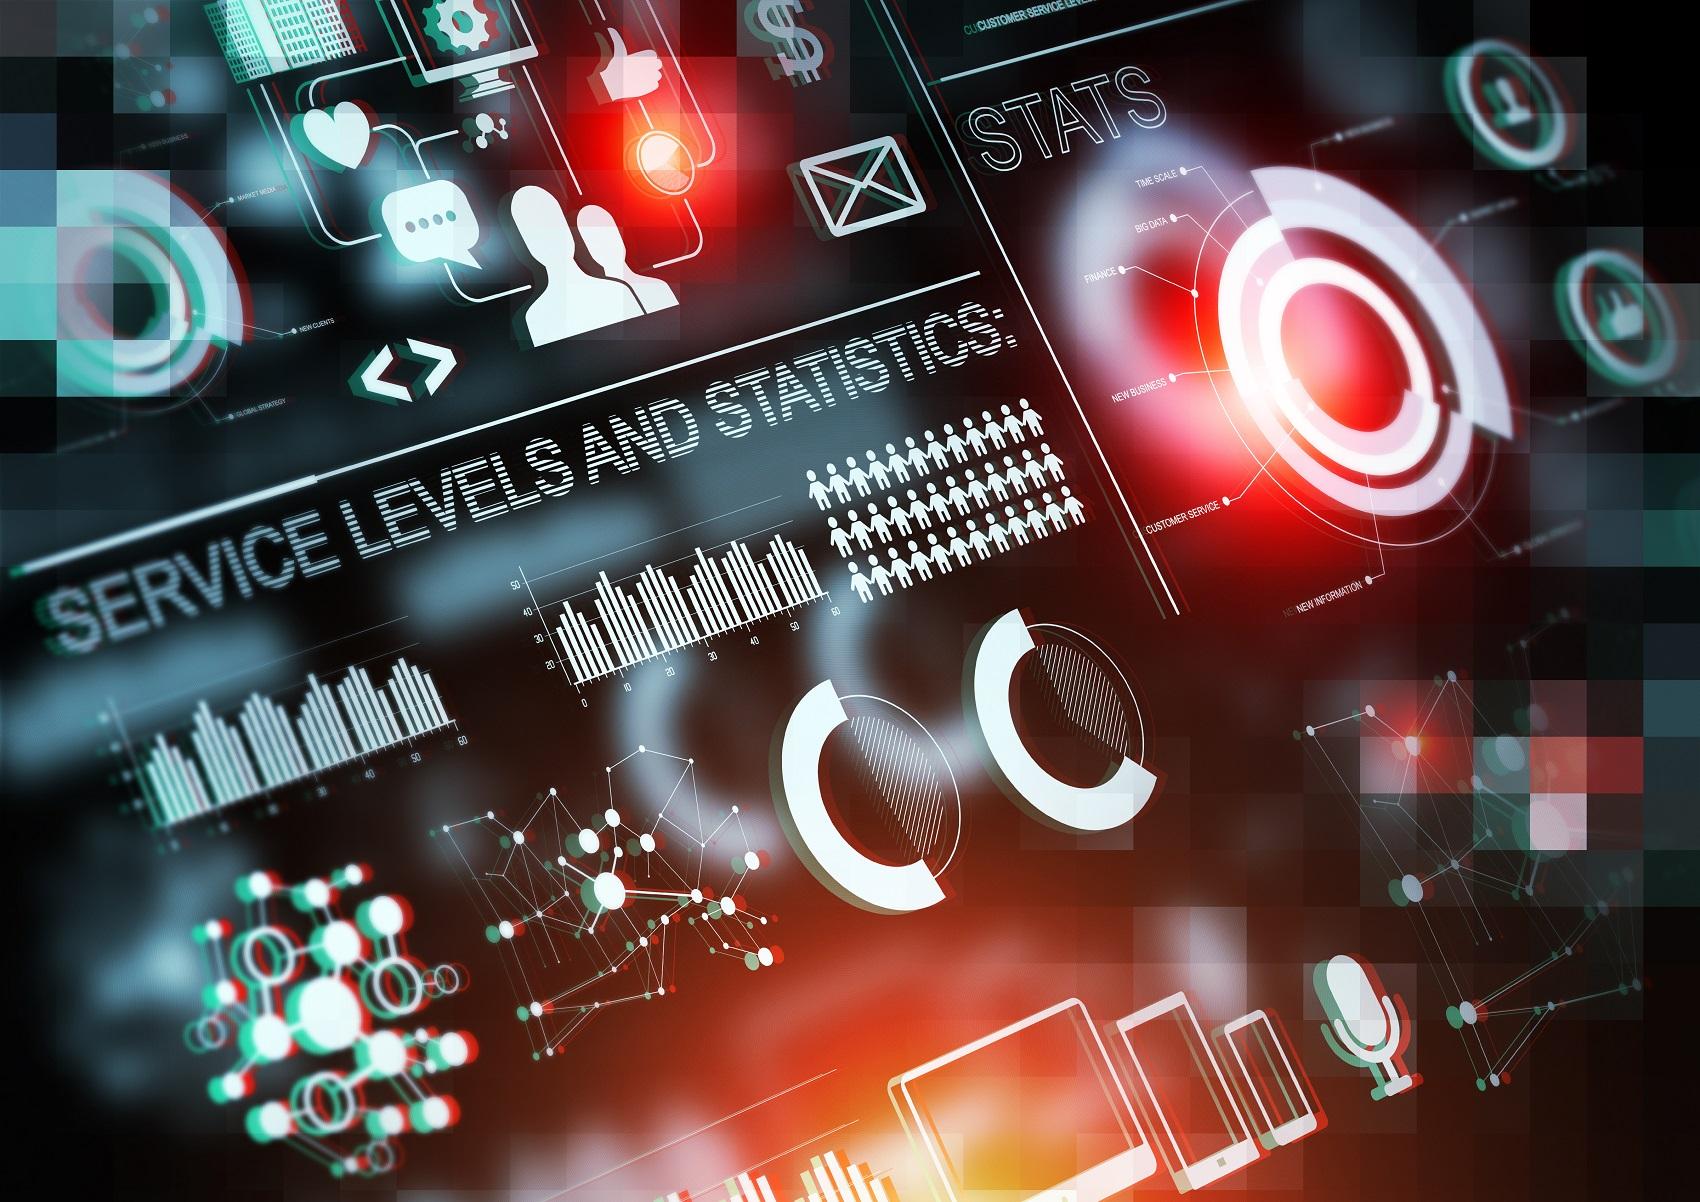 Customer data – what's the score? TechNative